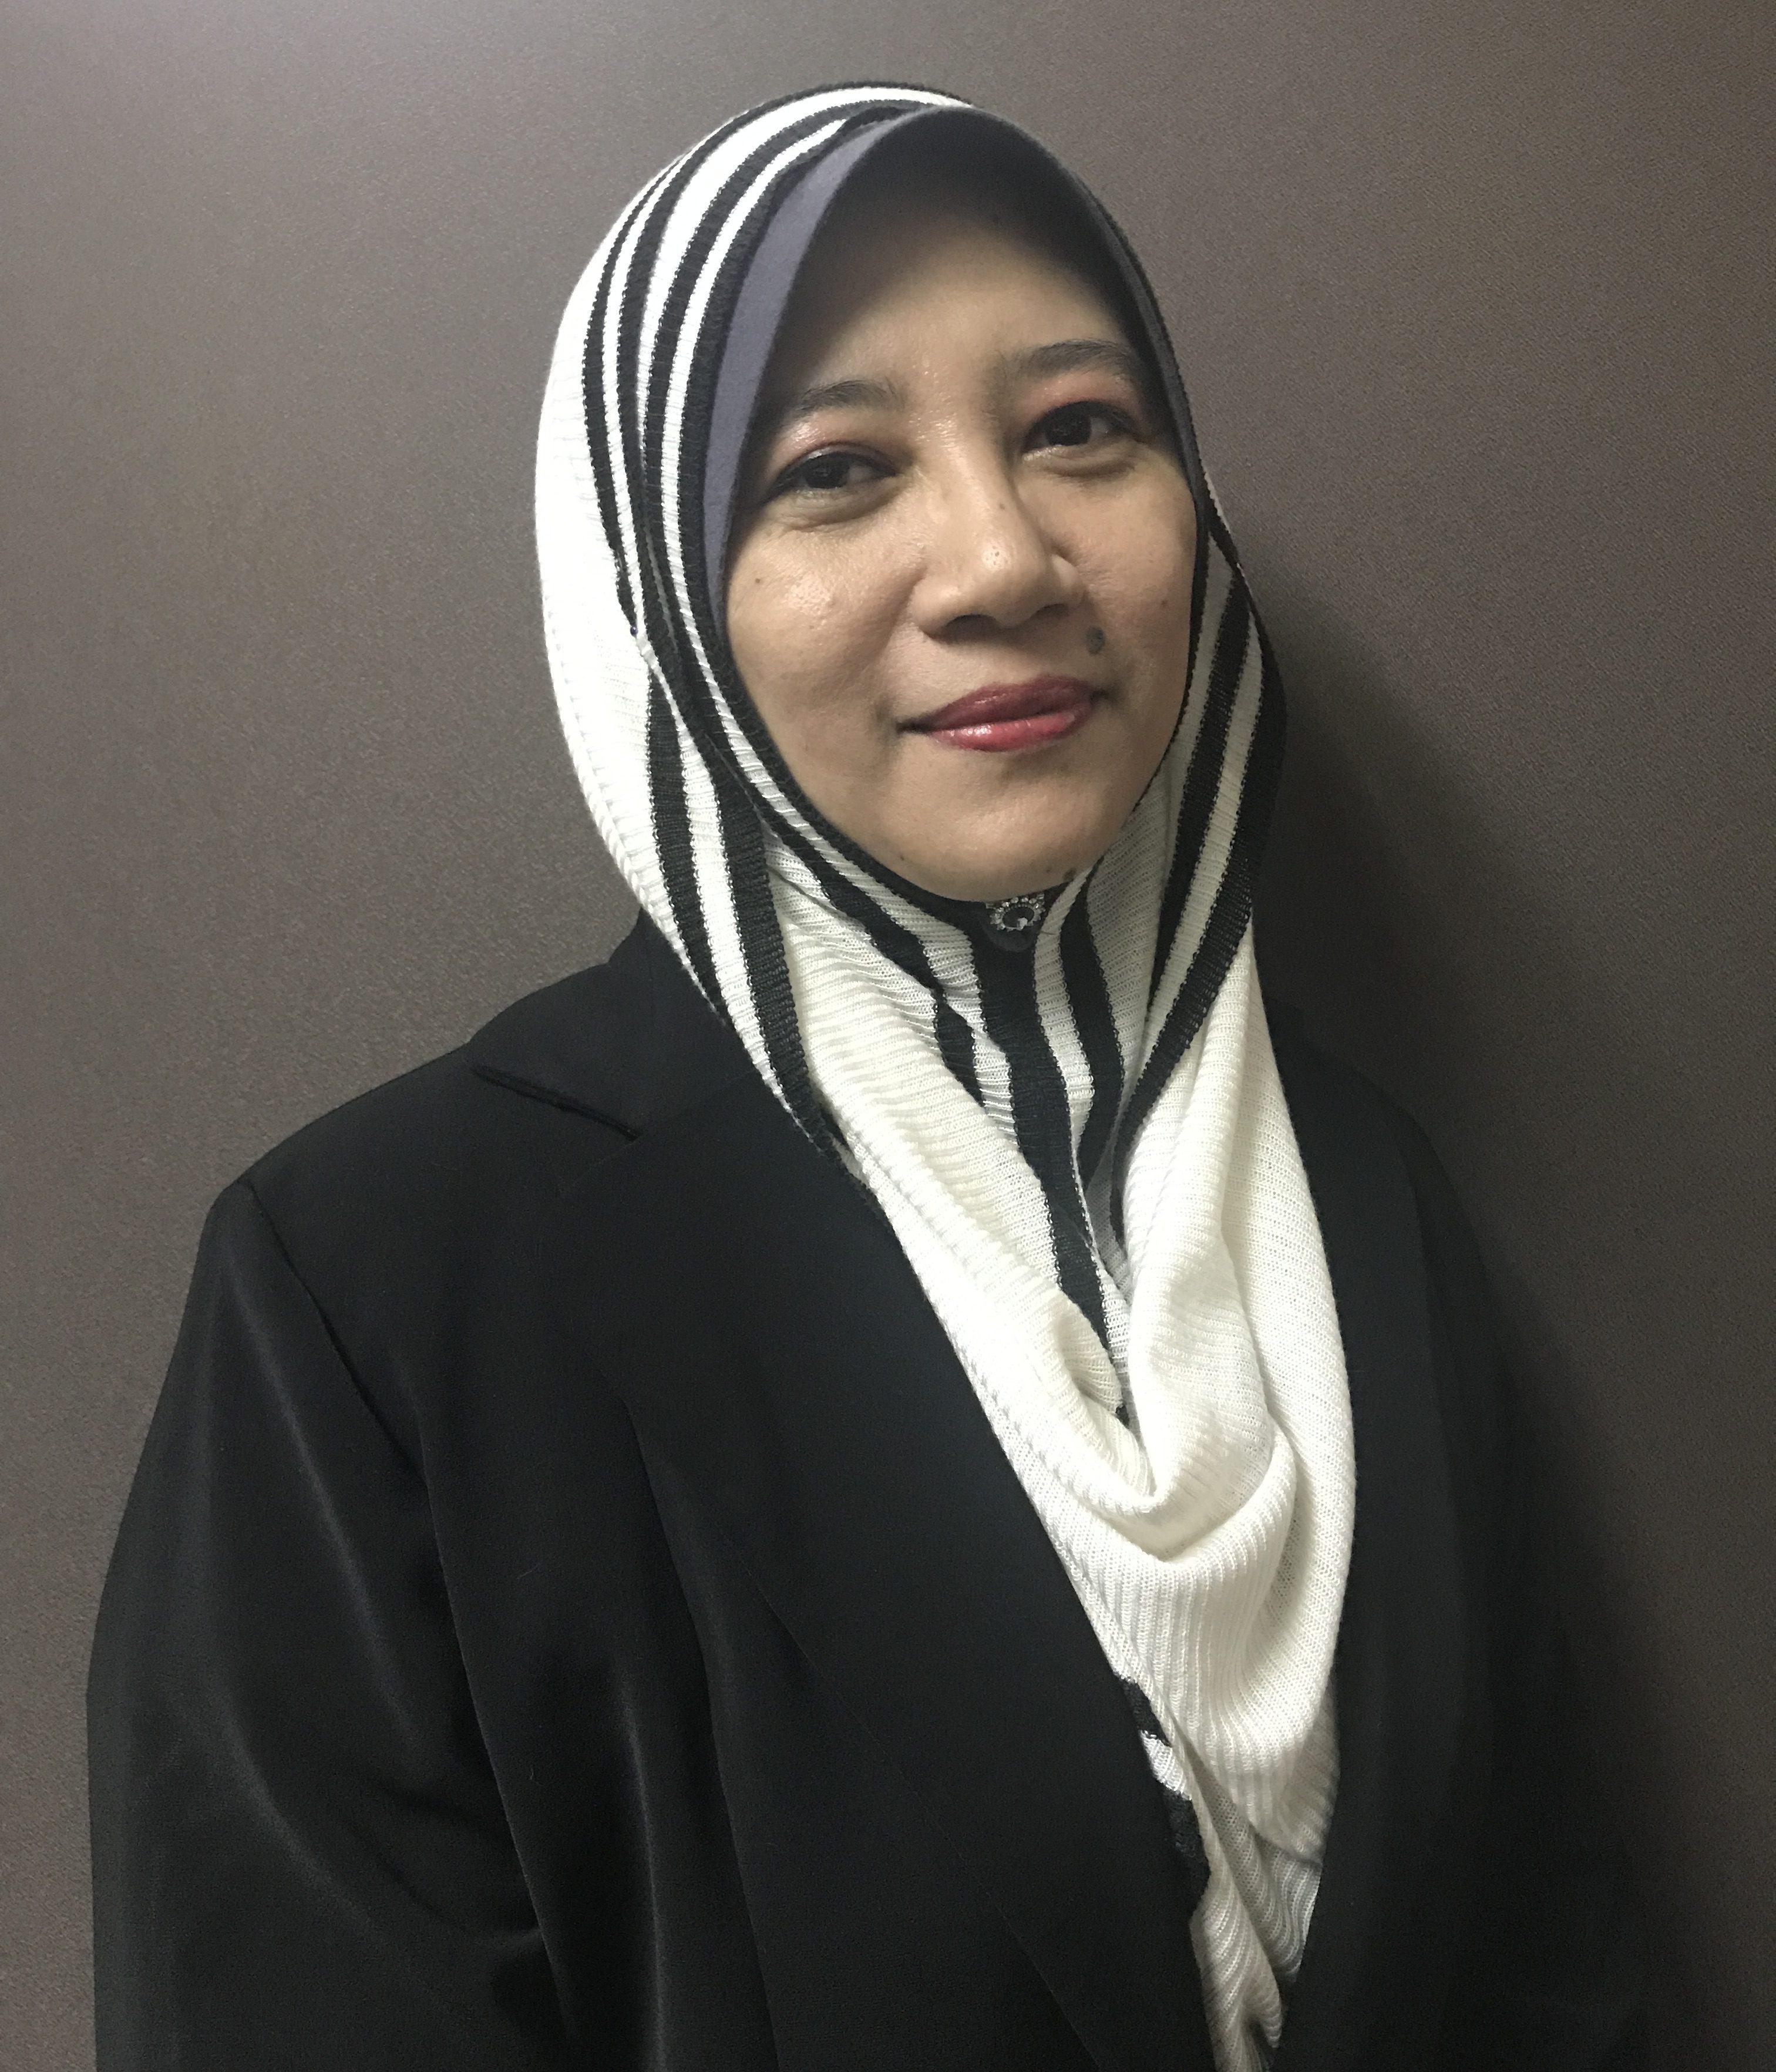 AMALINA ABDUL RASHID